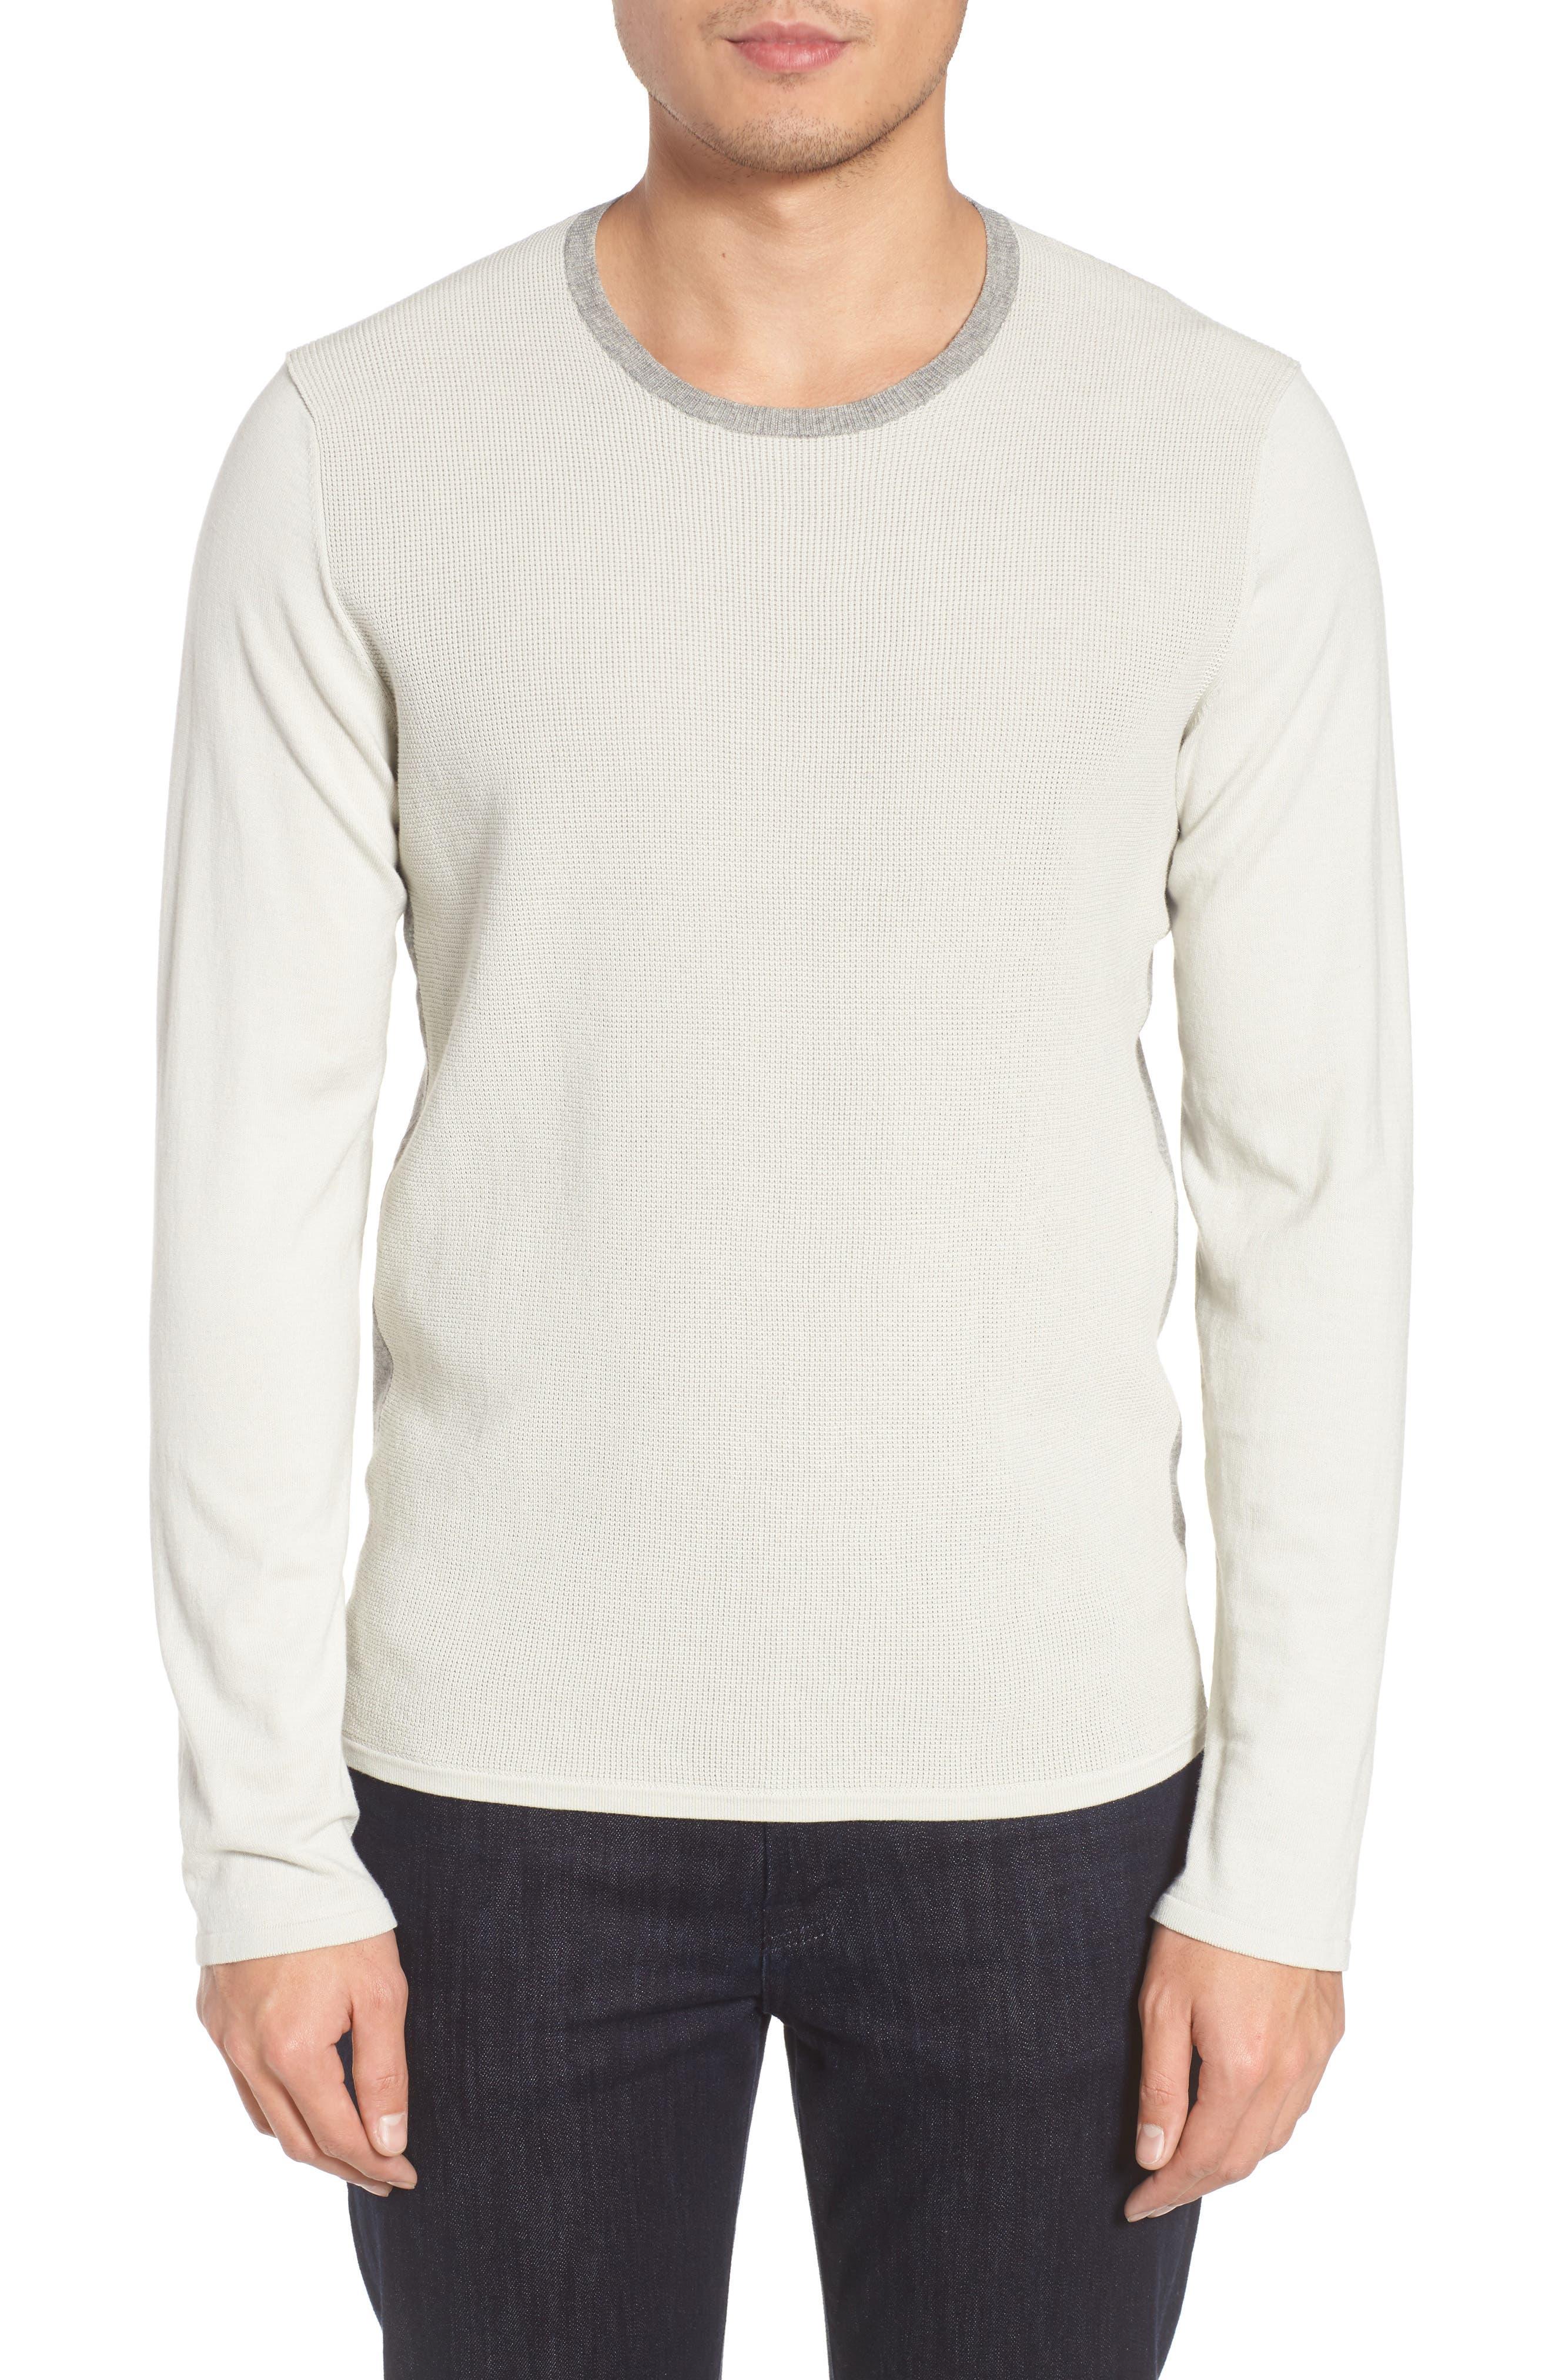 ZACHARY PRELL, Lakeside Sweater, Main thumbnail 1, color, LIGHT GREY